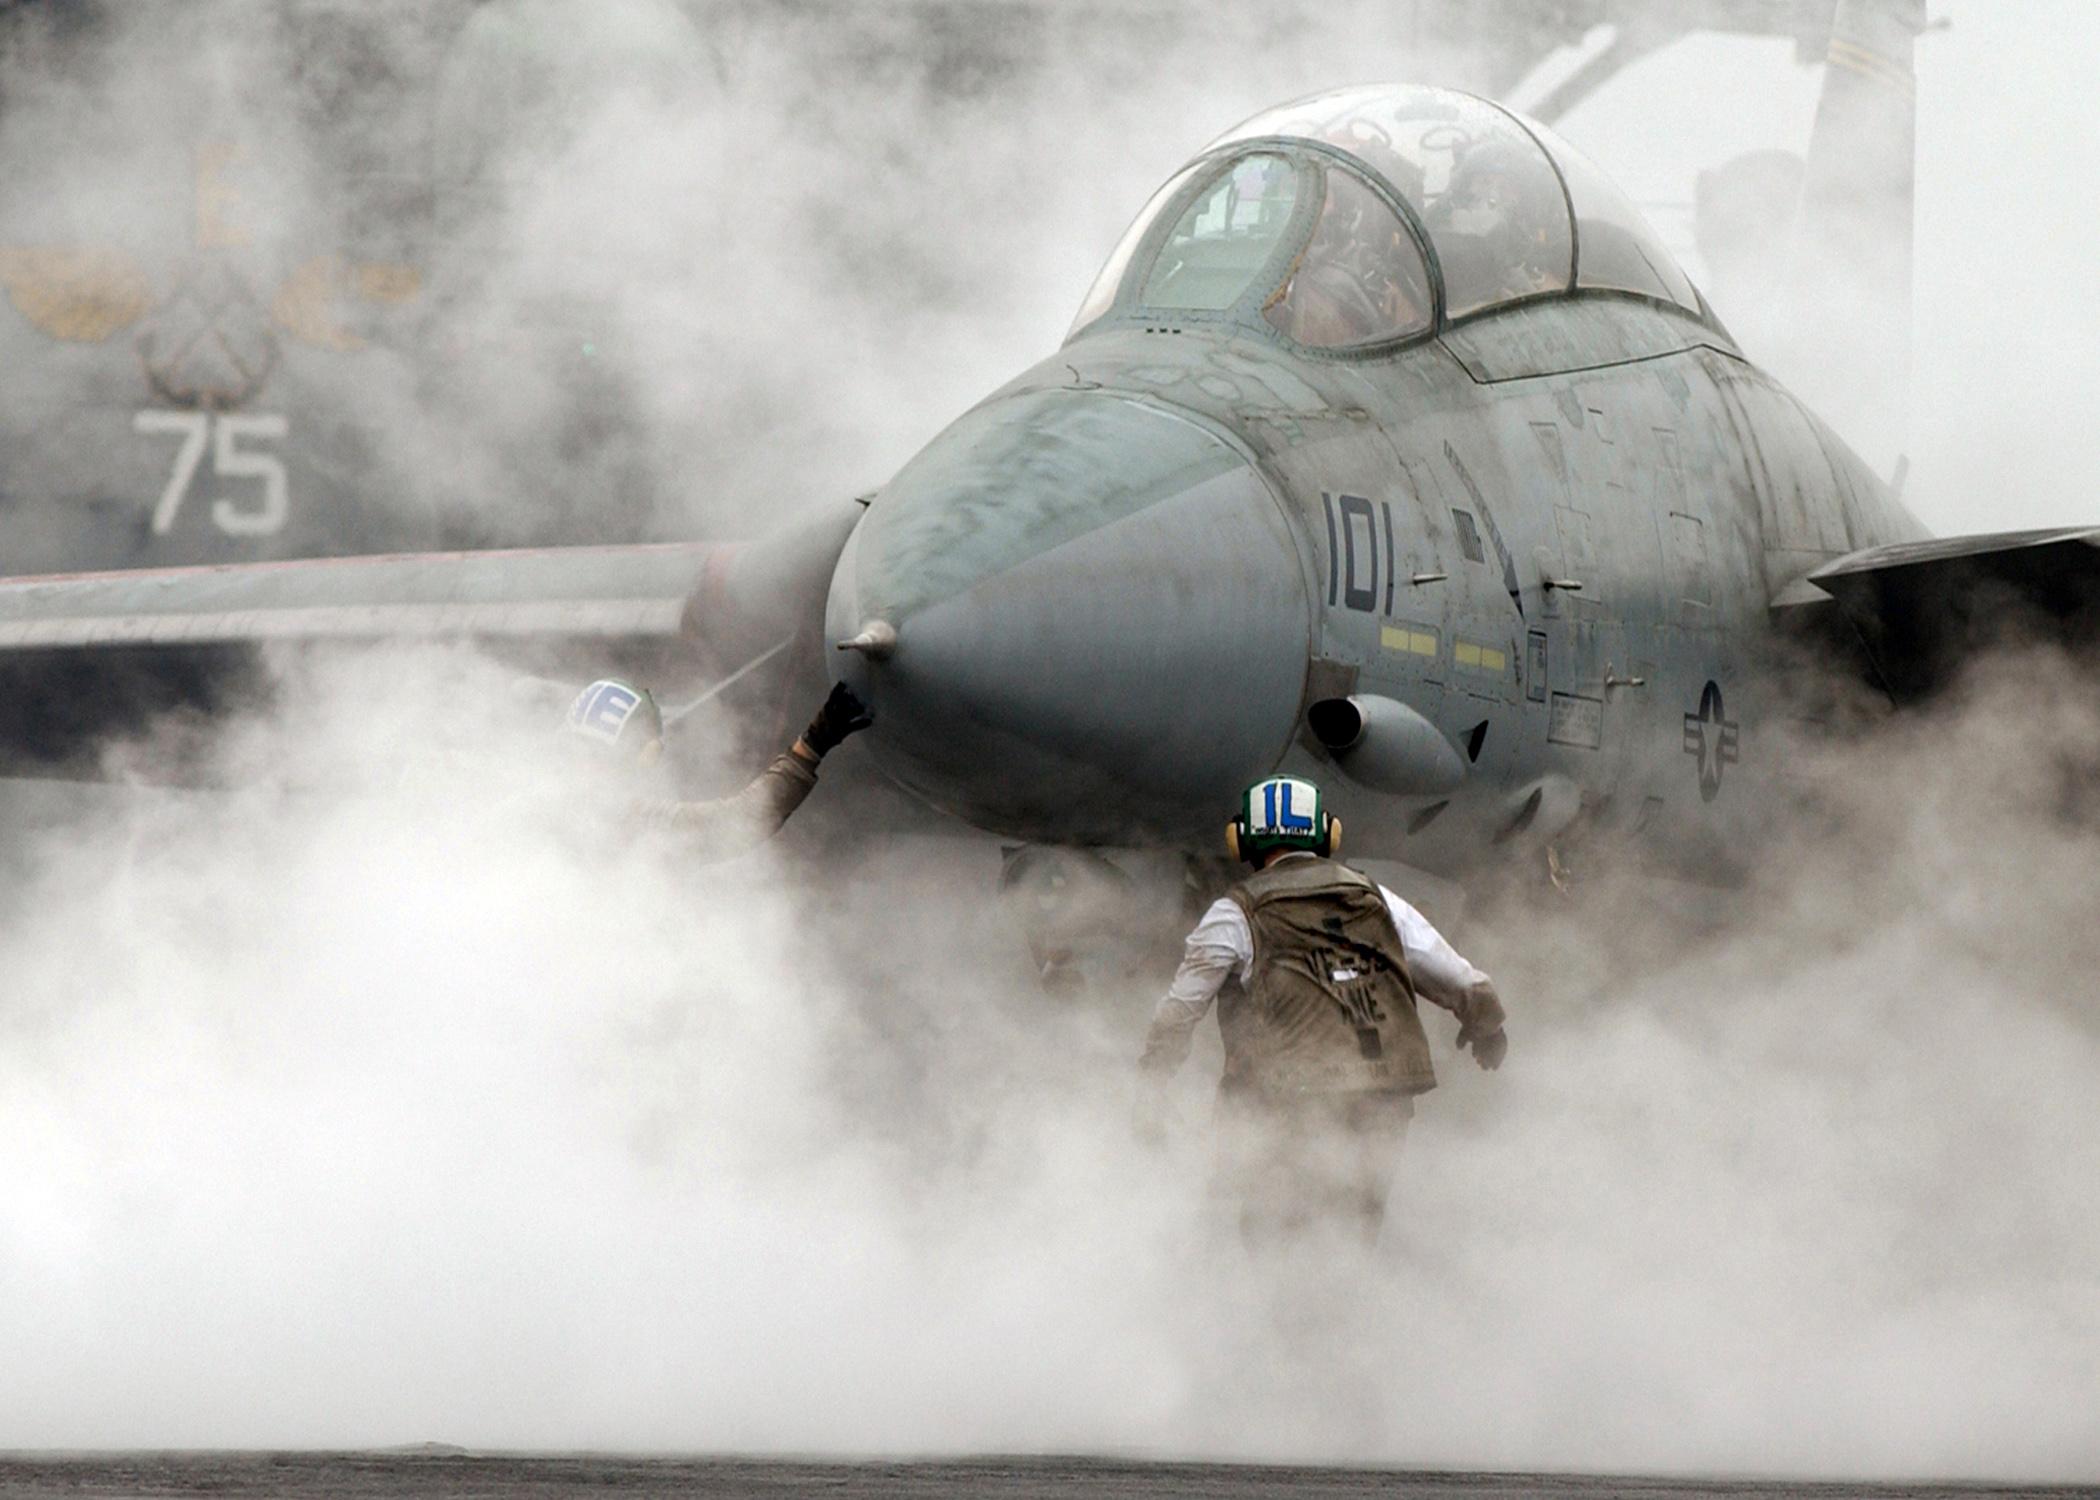 F 14 (戦闘機)の画像 p1_35